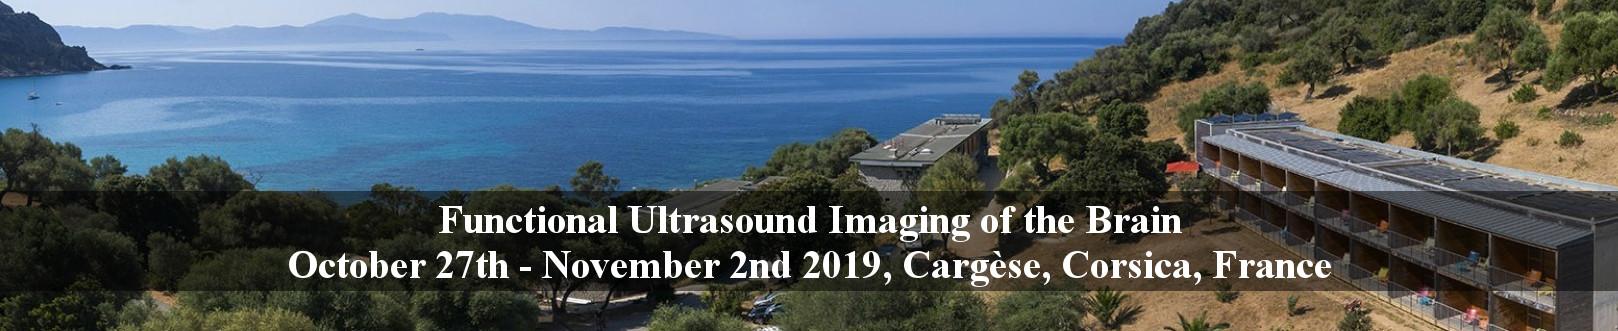 fUSbrain2019: International workshop on Functional Ultrasound Imaging of the Brain